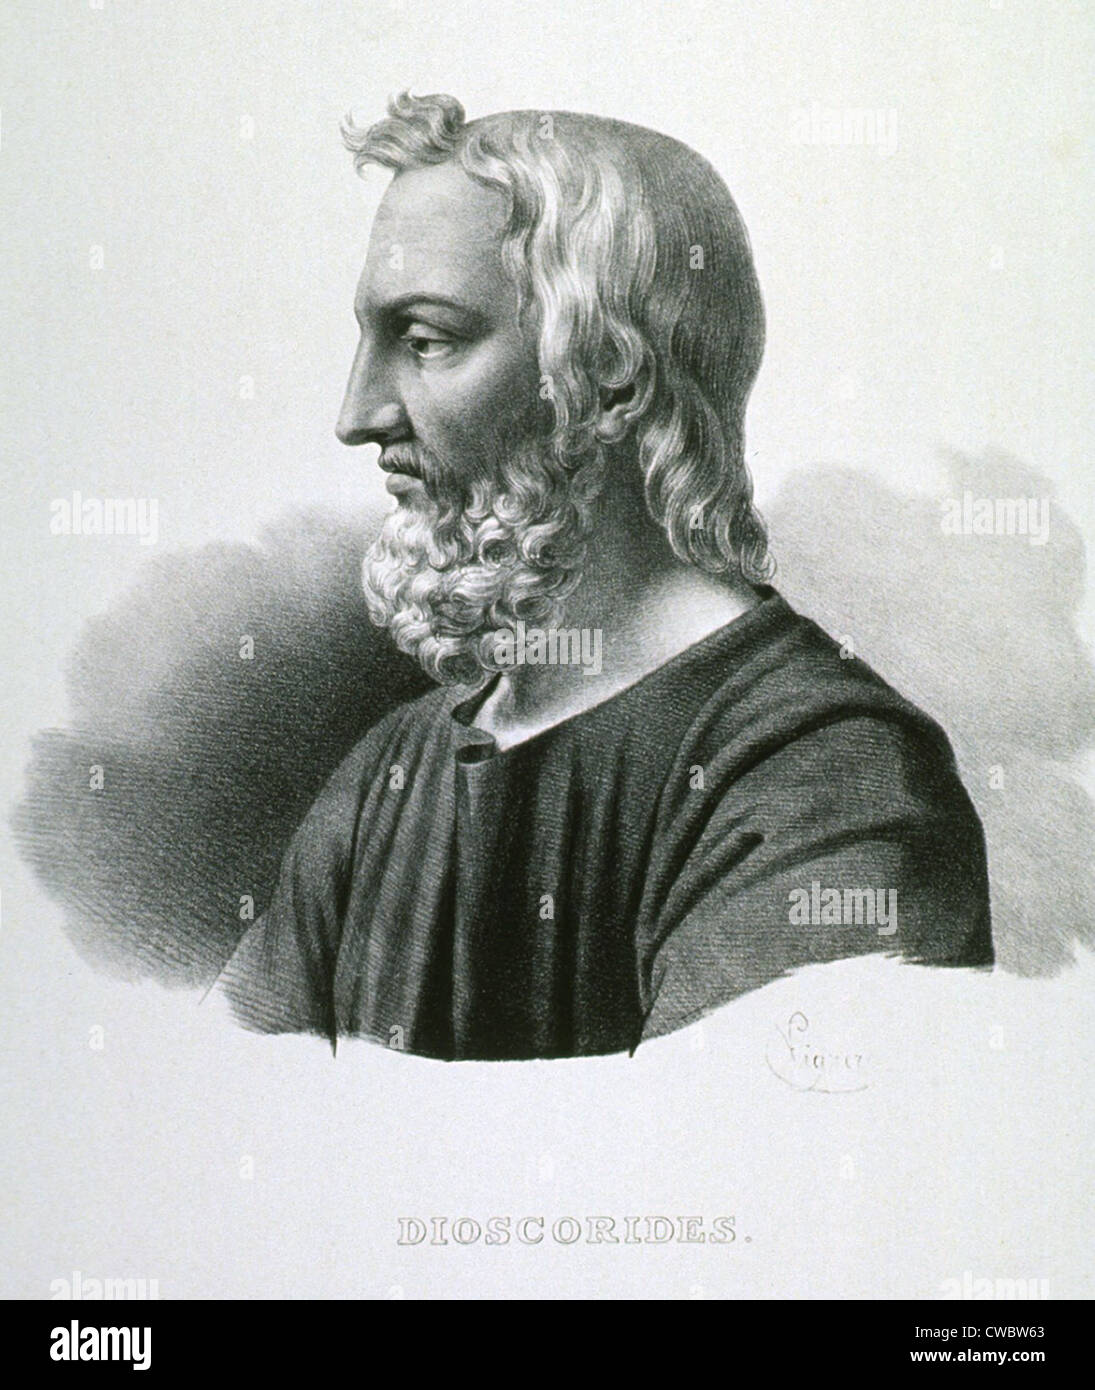 Pedanius Dioscorides (40-90 AD), Greek botanist and pharmacologist, wrote DE MATERIA MEDICA (REGARDING MEDICAL MATTERS), - Stock Image